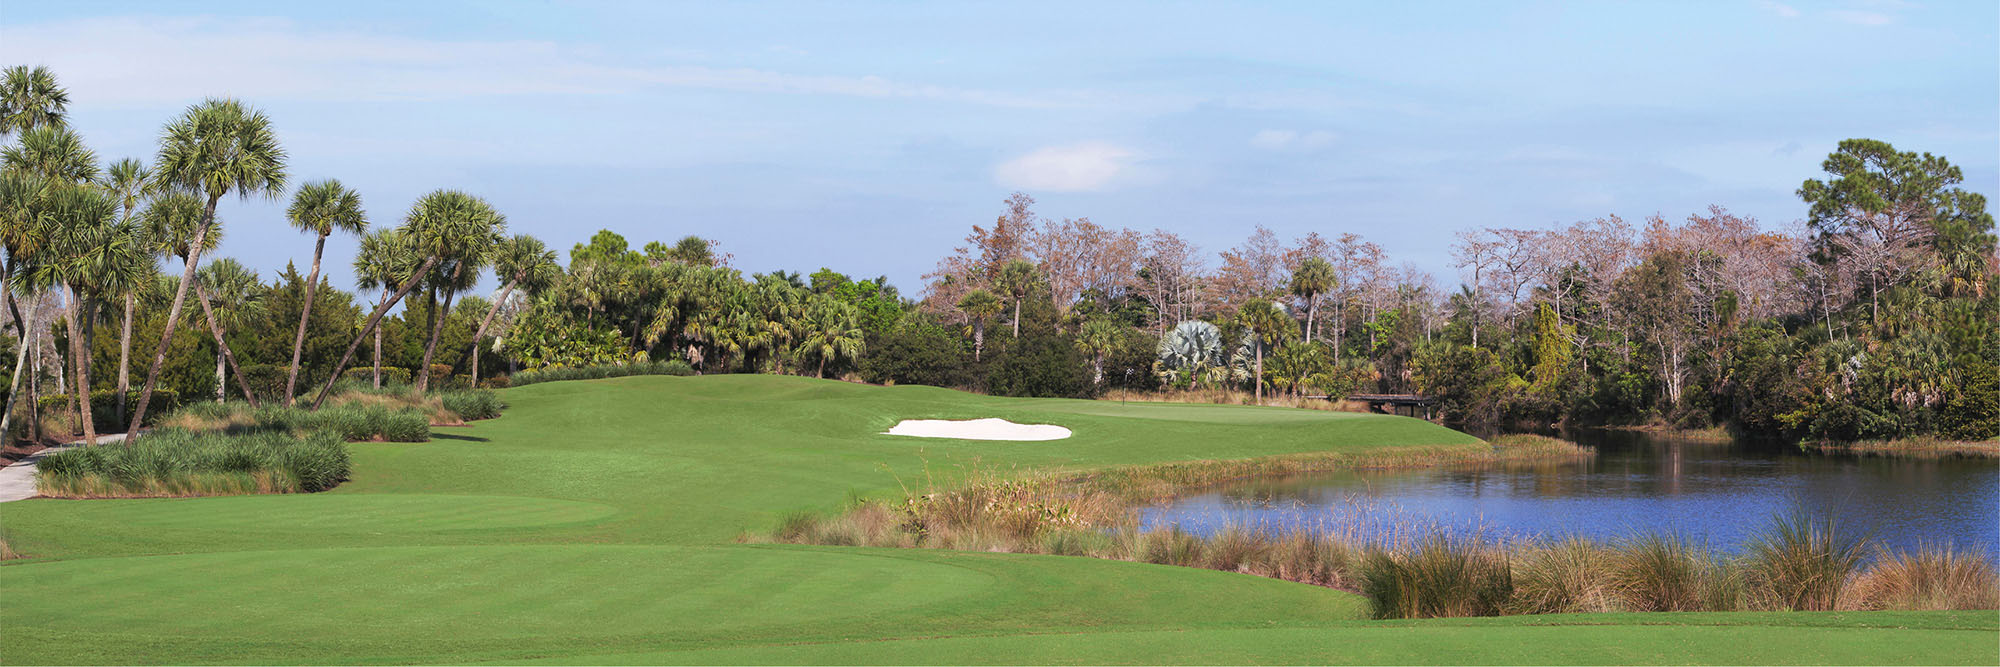 Golf Course Image - Mirasol Sunset No. 8